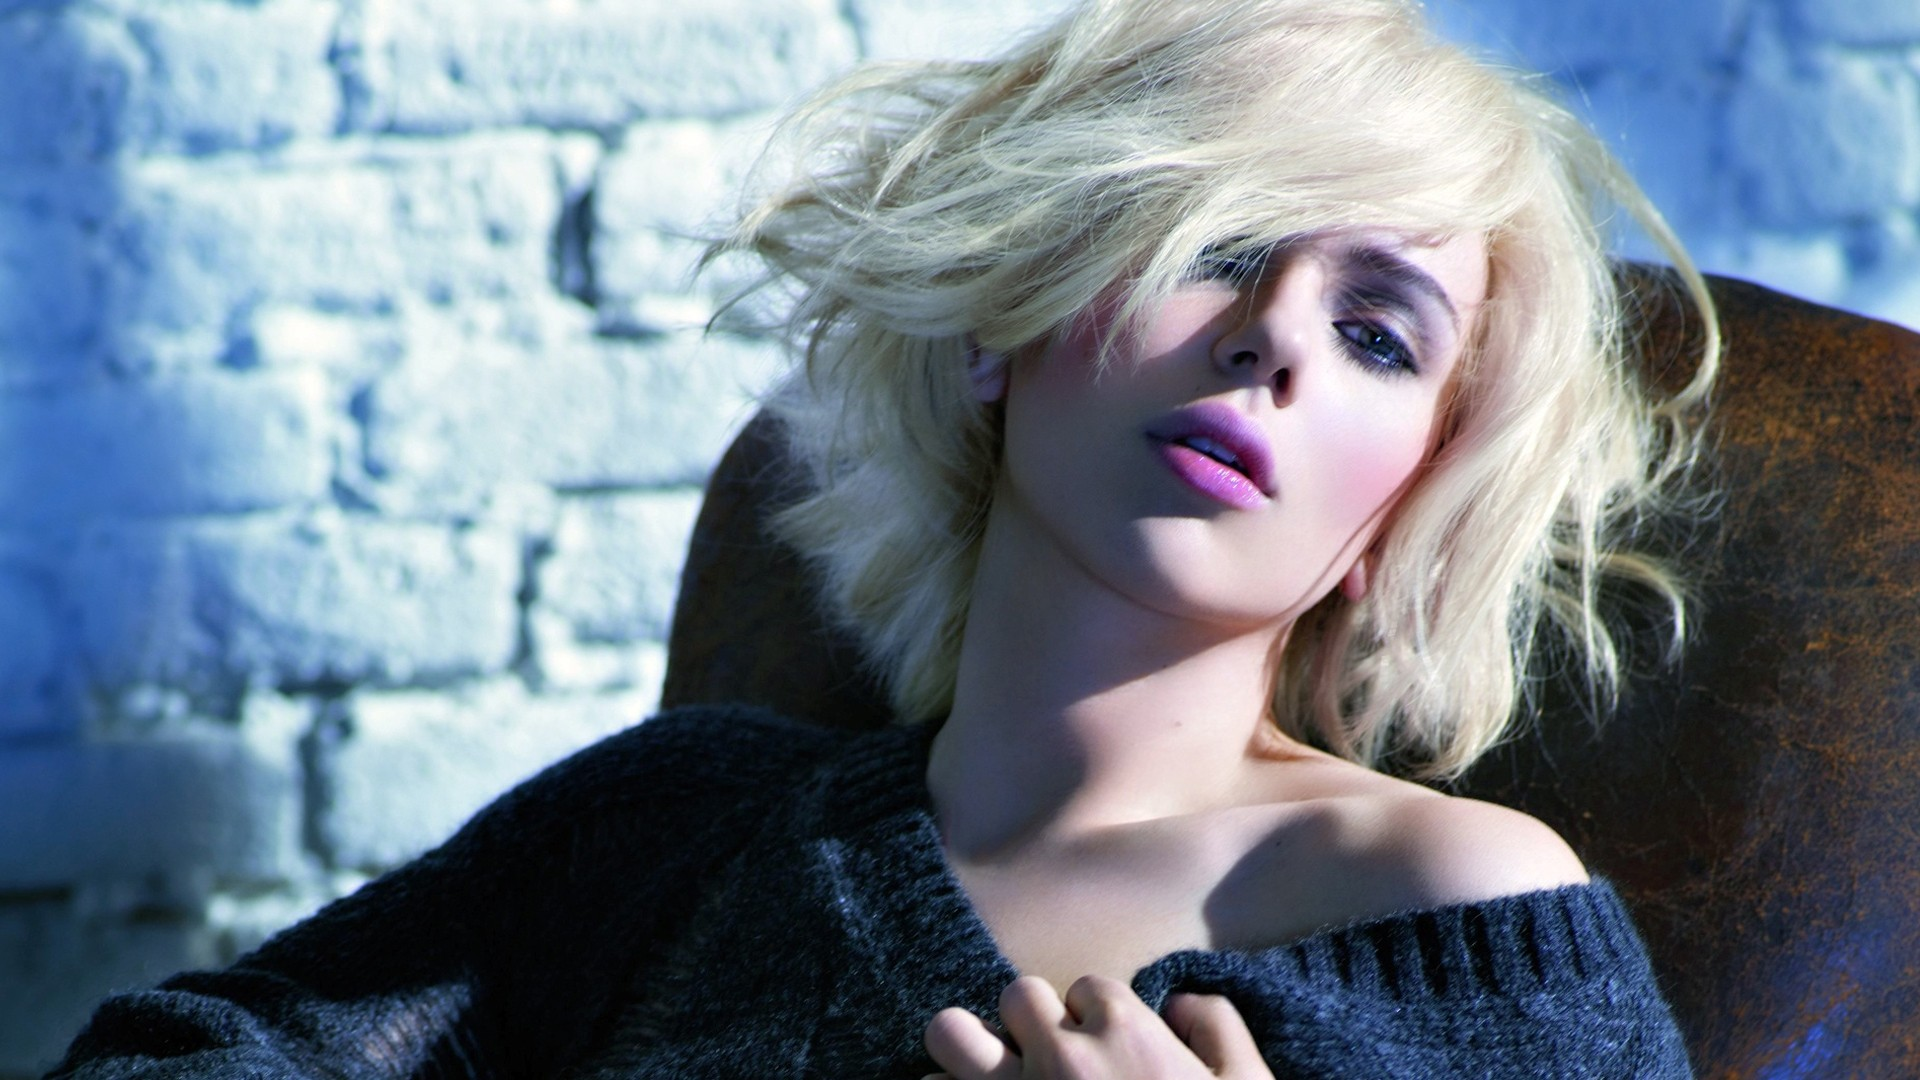 Scarlett Johansson Background Wallpaper